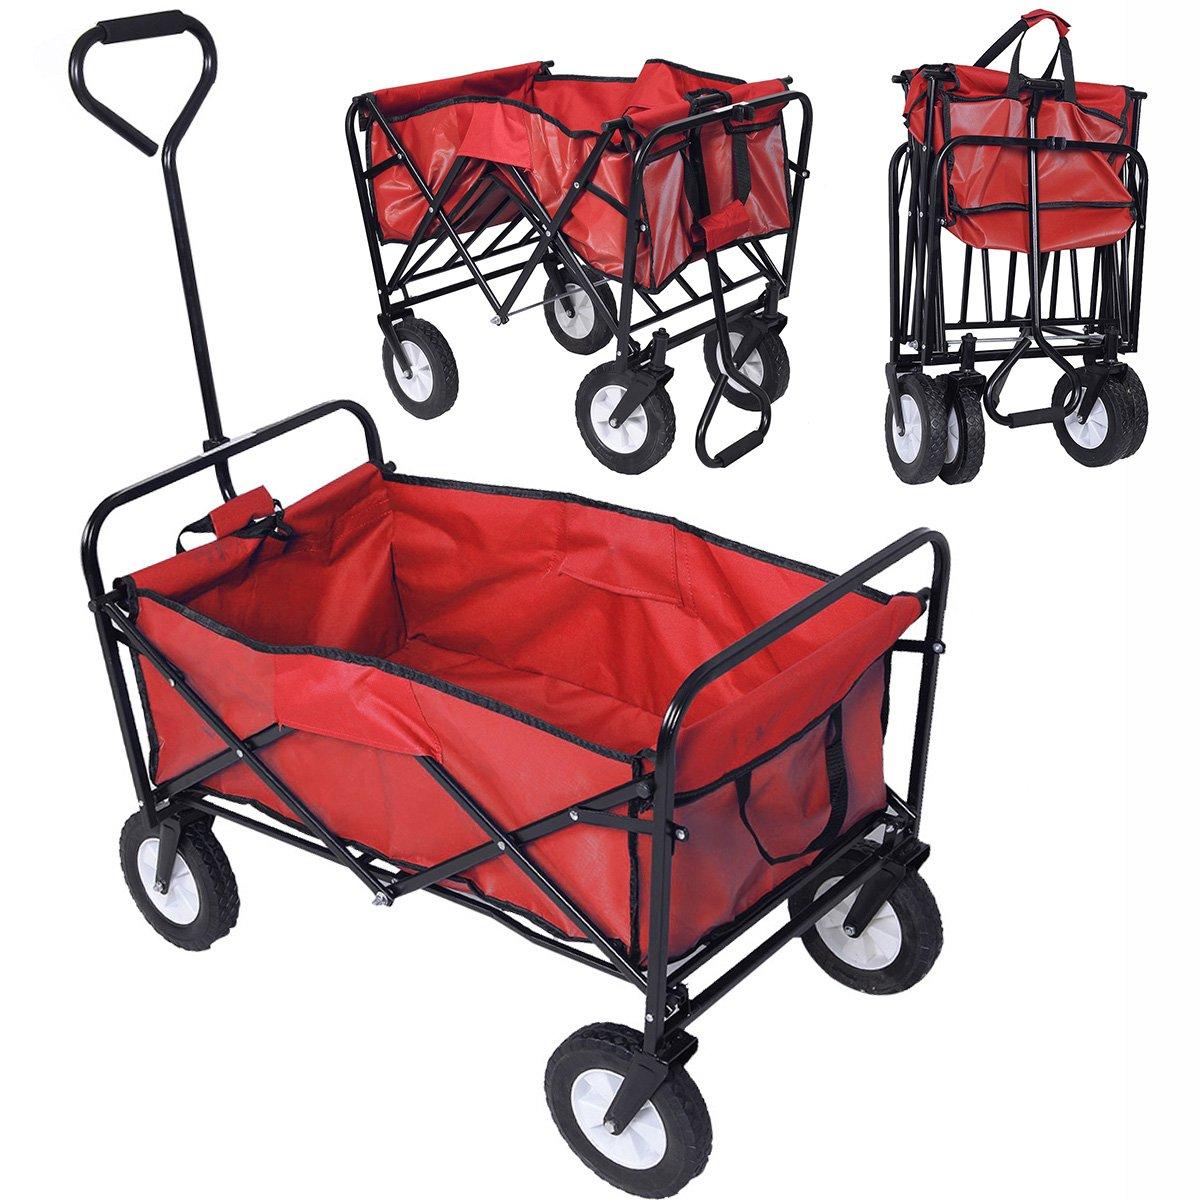 CASART Foldable Trolley Heavy Duty Cart Pull Wagon 4 Wheel Truck Large XL Size Wheelbarrow Garden Outdoor (RED)